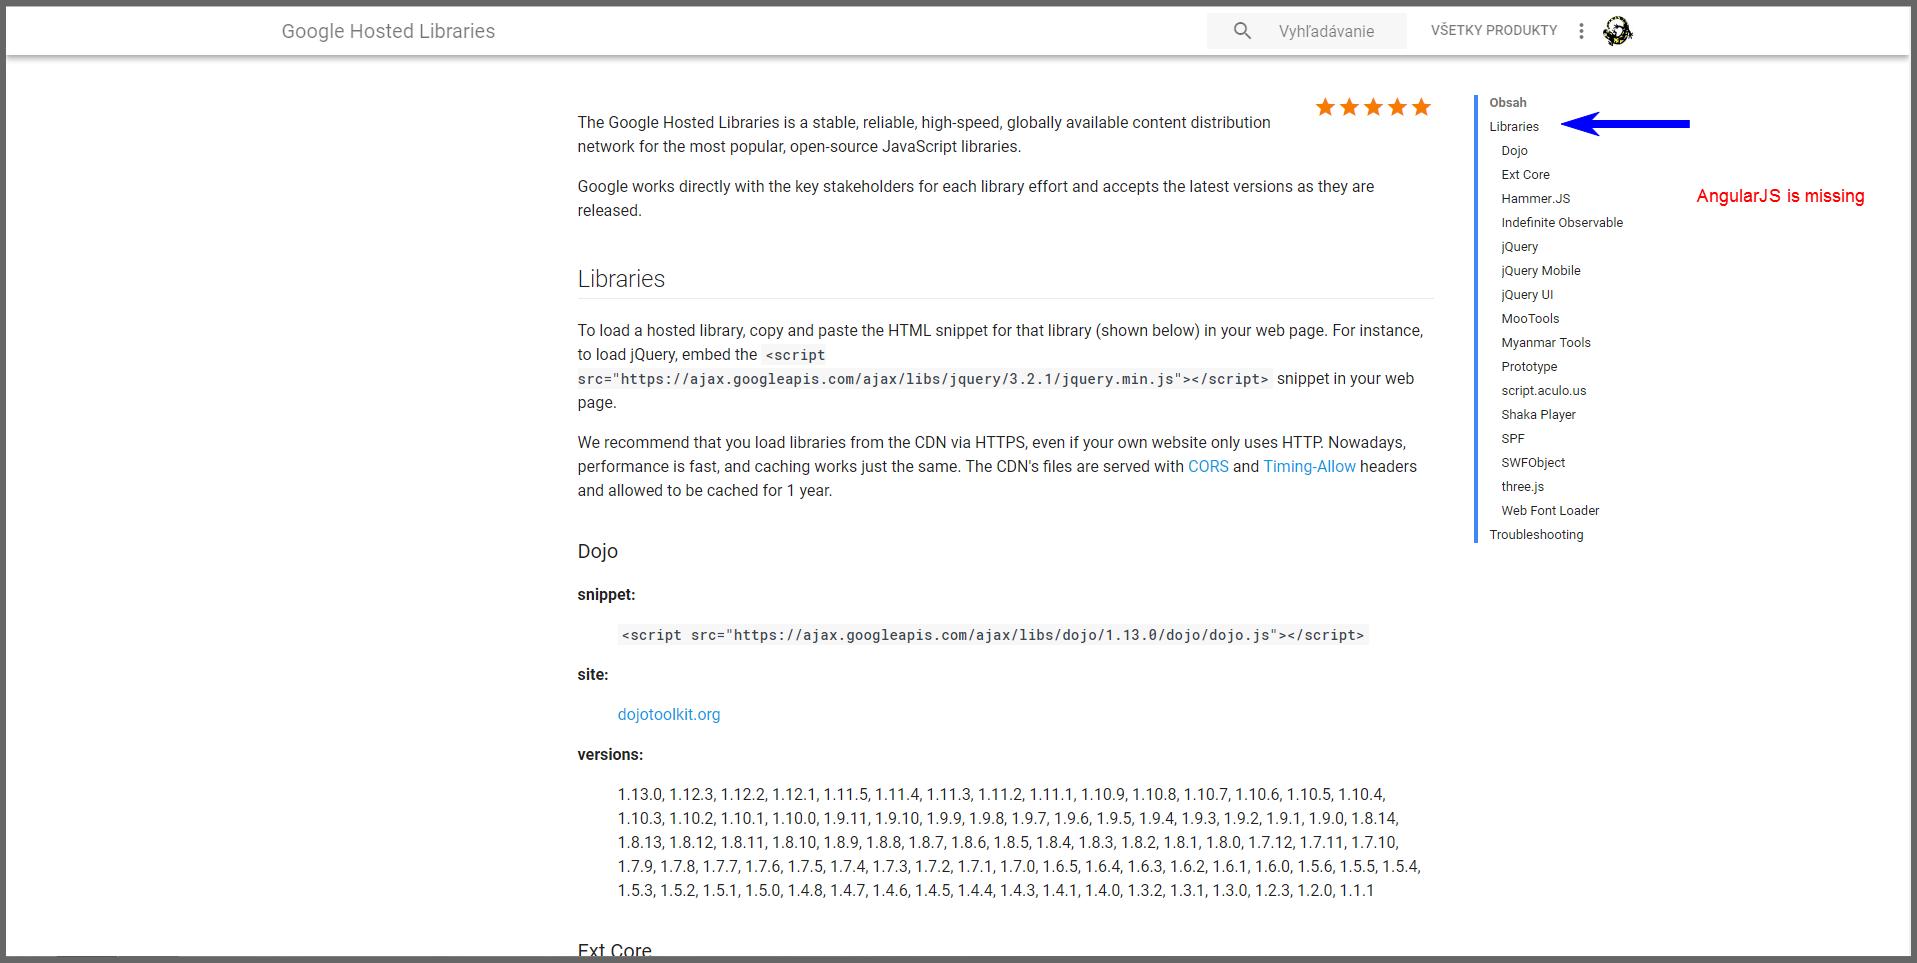 CDN] Google Hosted Libraries still offer angular 1 6 4 as the newest